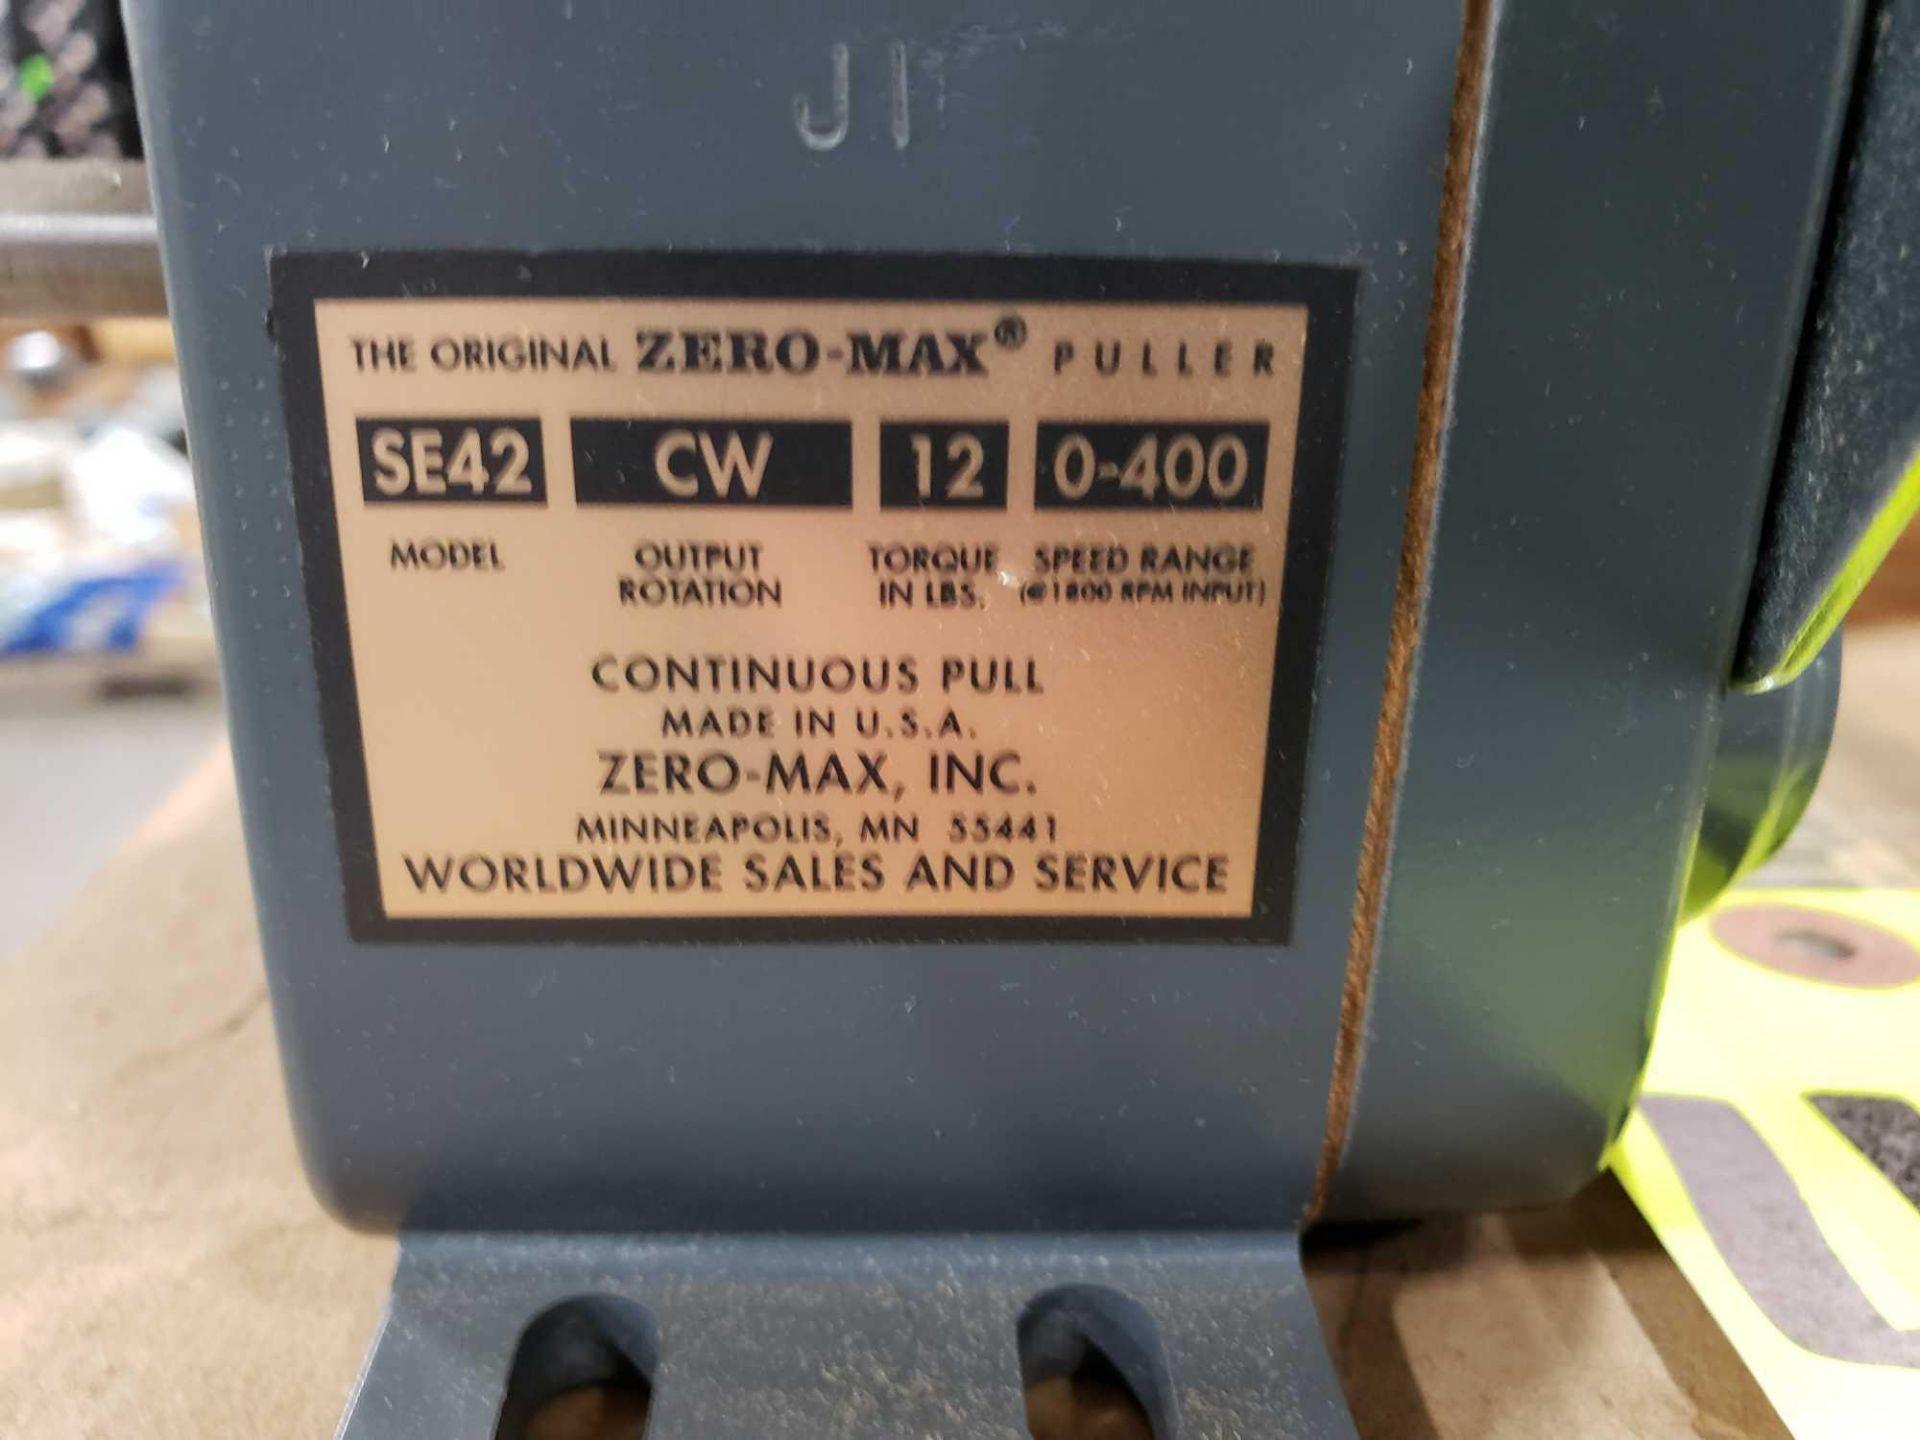 Lot 47 - Zero-max drive power block model SE42, CW output rotation, 12lb torque, 0-400 speed range. New.